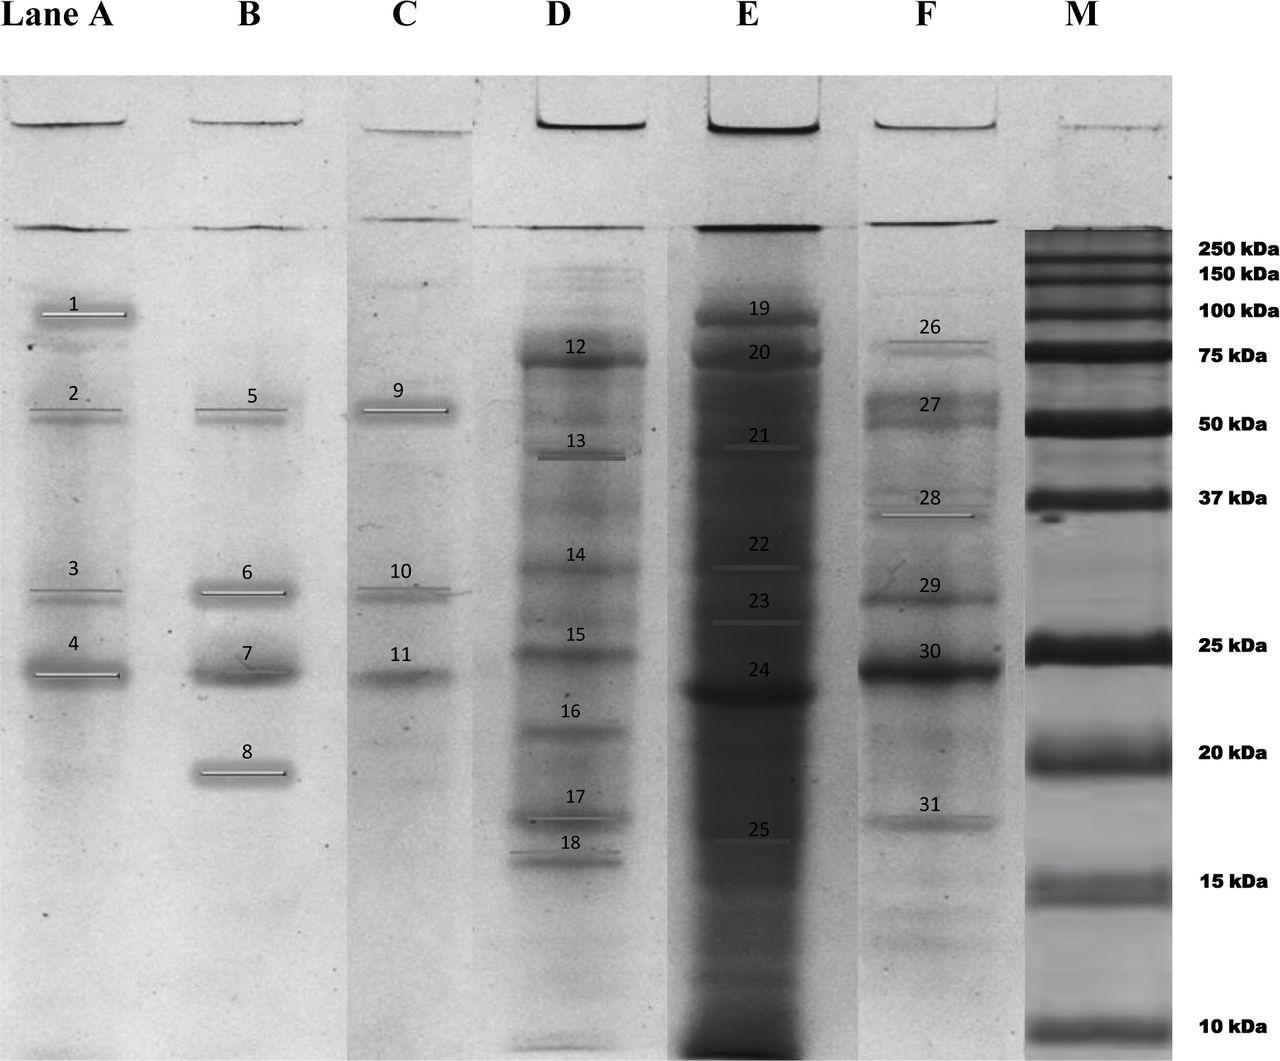 Description of novel marine bioflocculant-producing bacteria